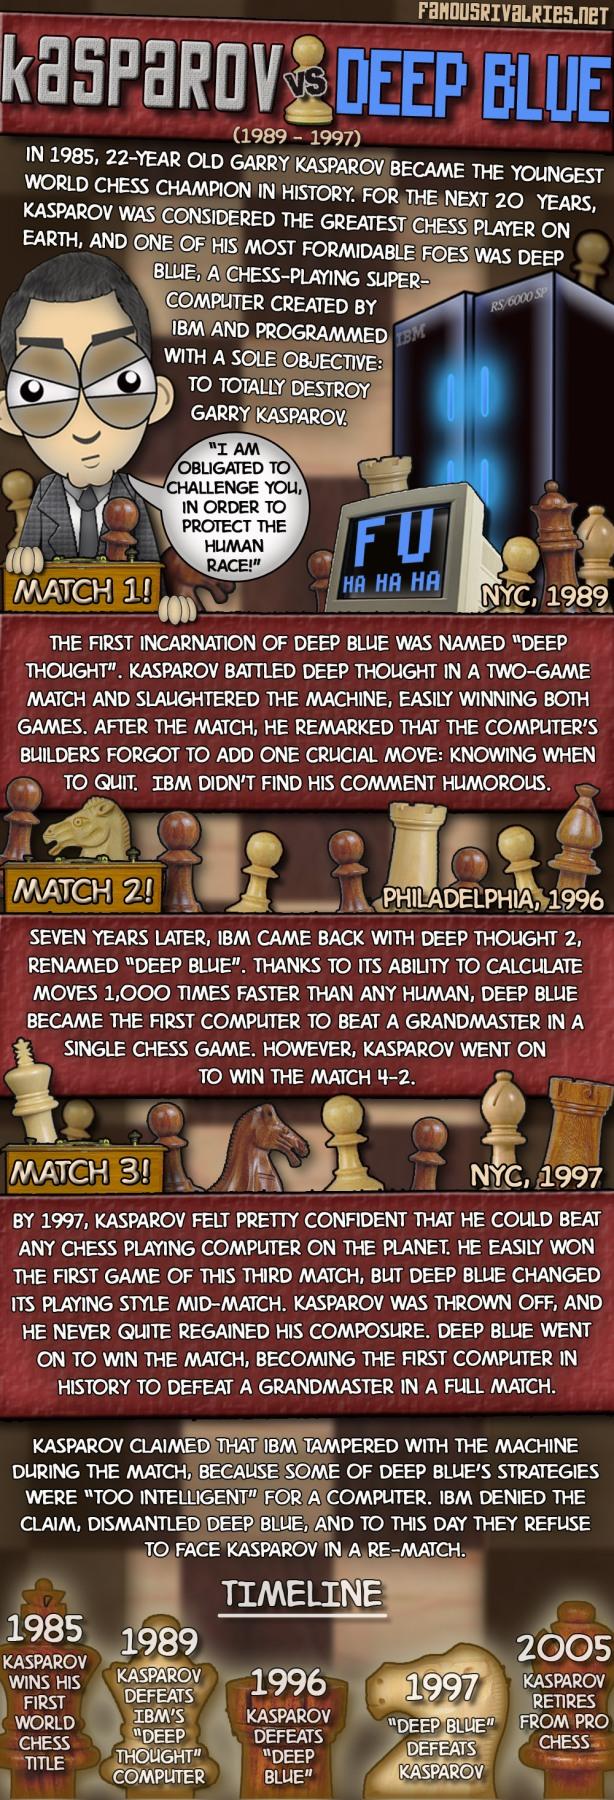 famous rivalries kasparov vs deep blue chess computer